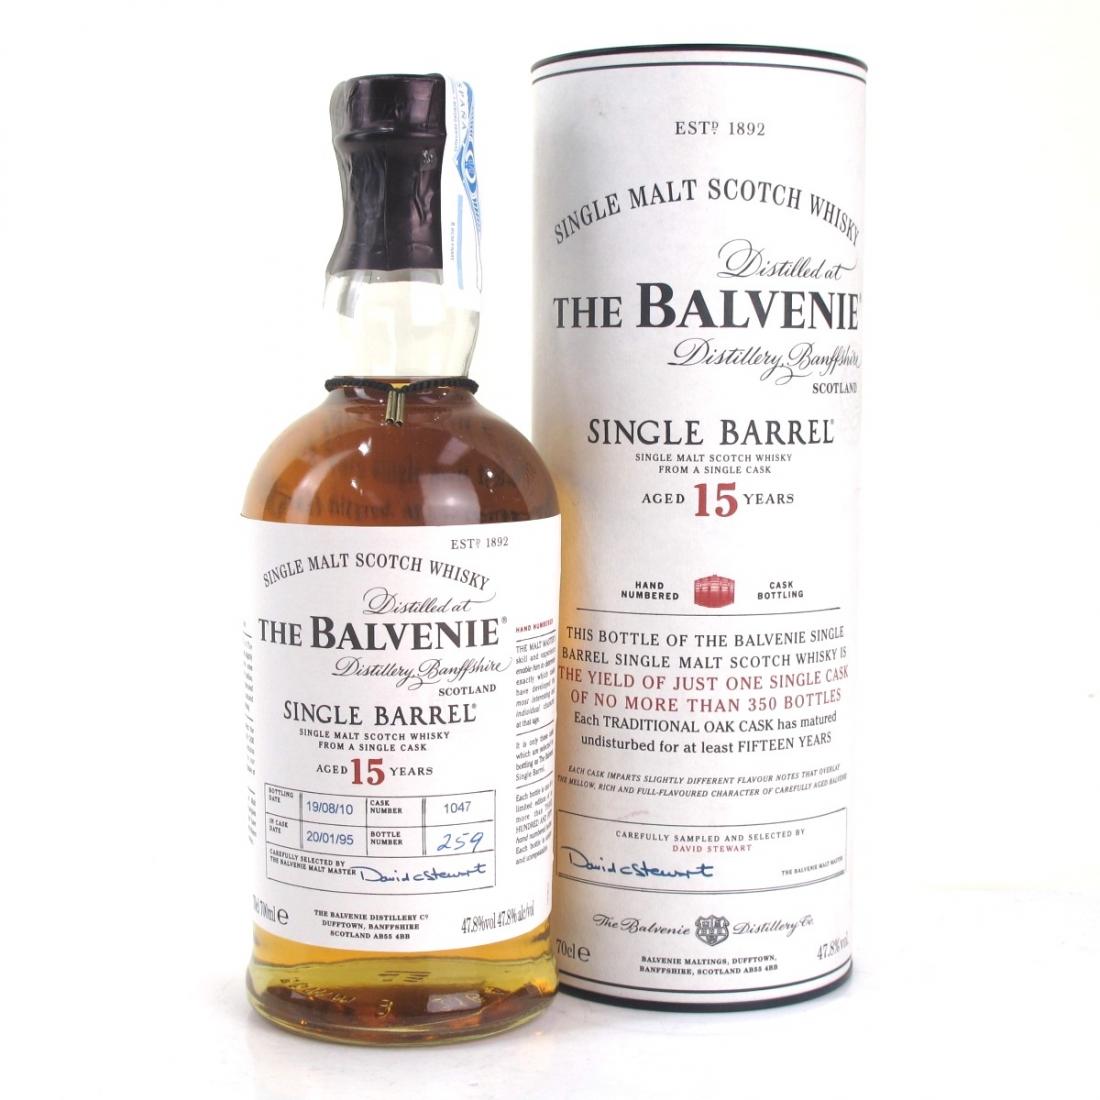 Balvenie 1995 15 Year Old Single Barrel